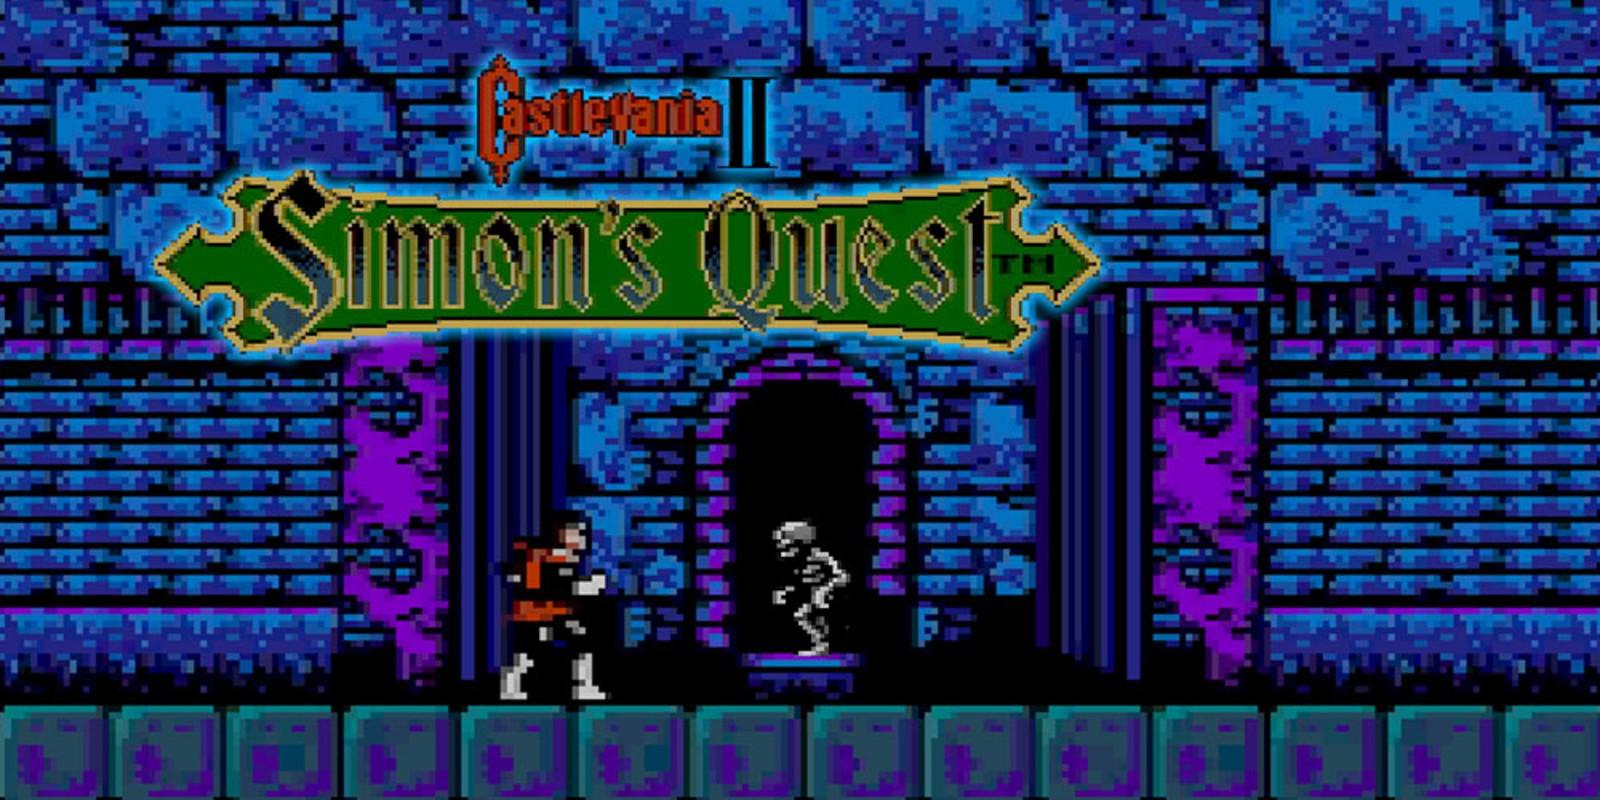 Castlevania II: Simon's Quest | NES | Games | Nintendo